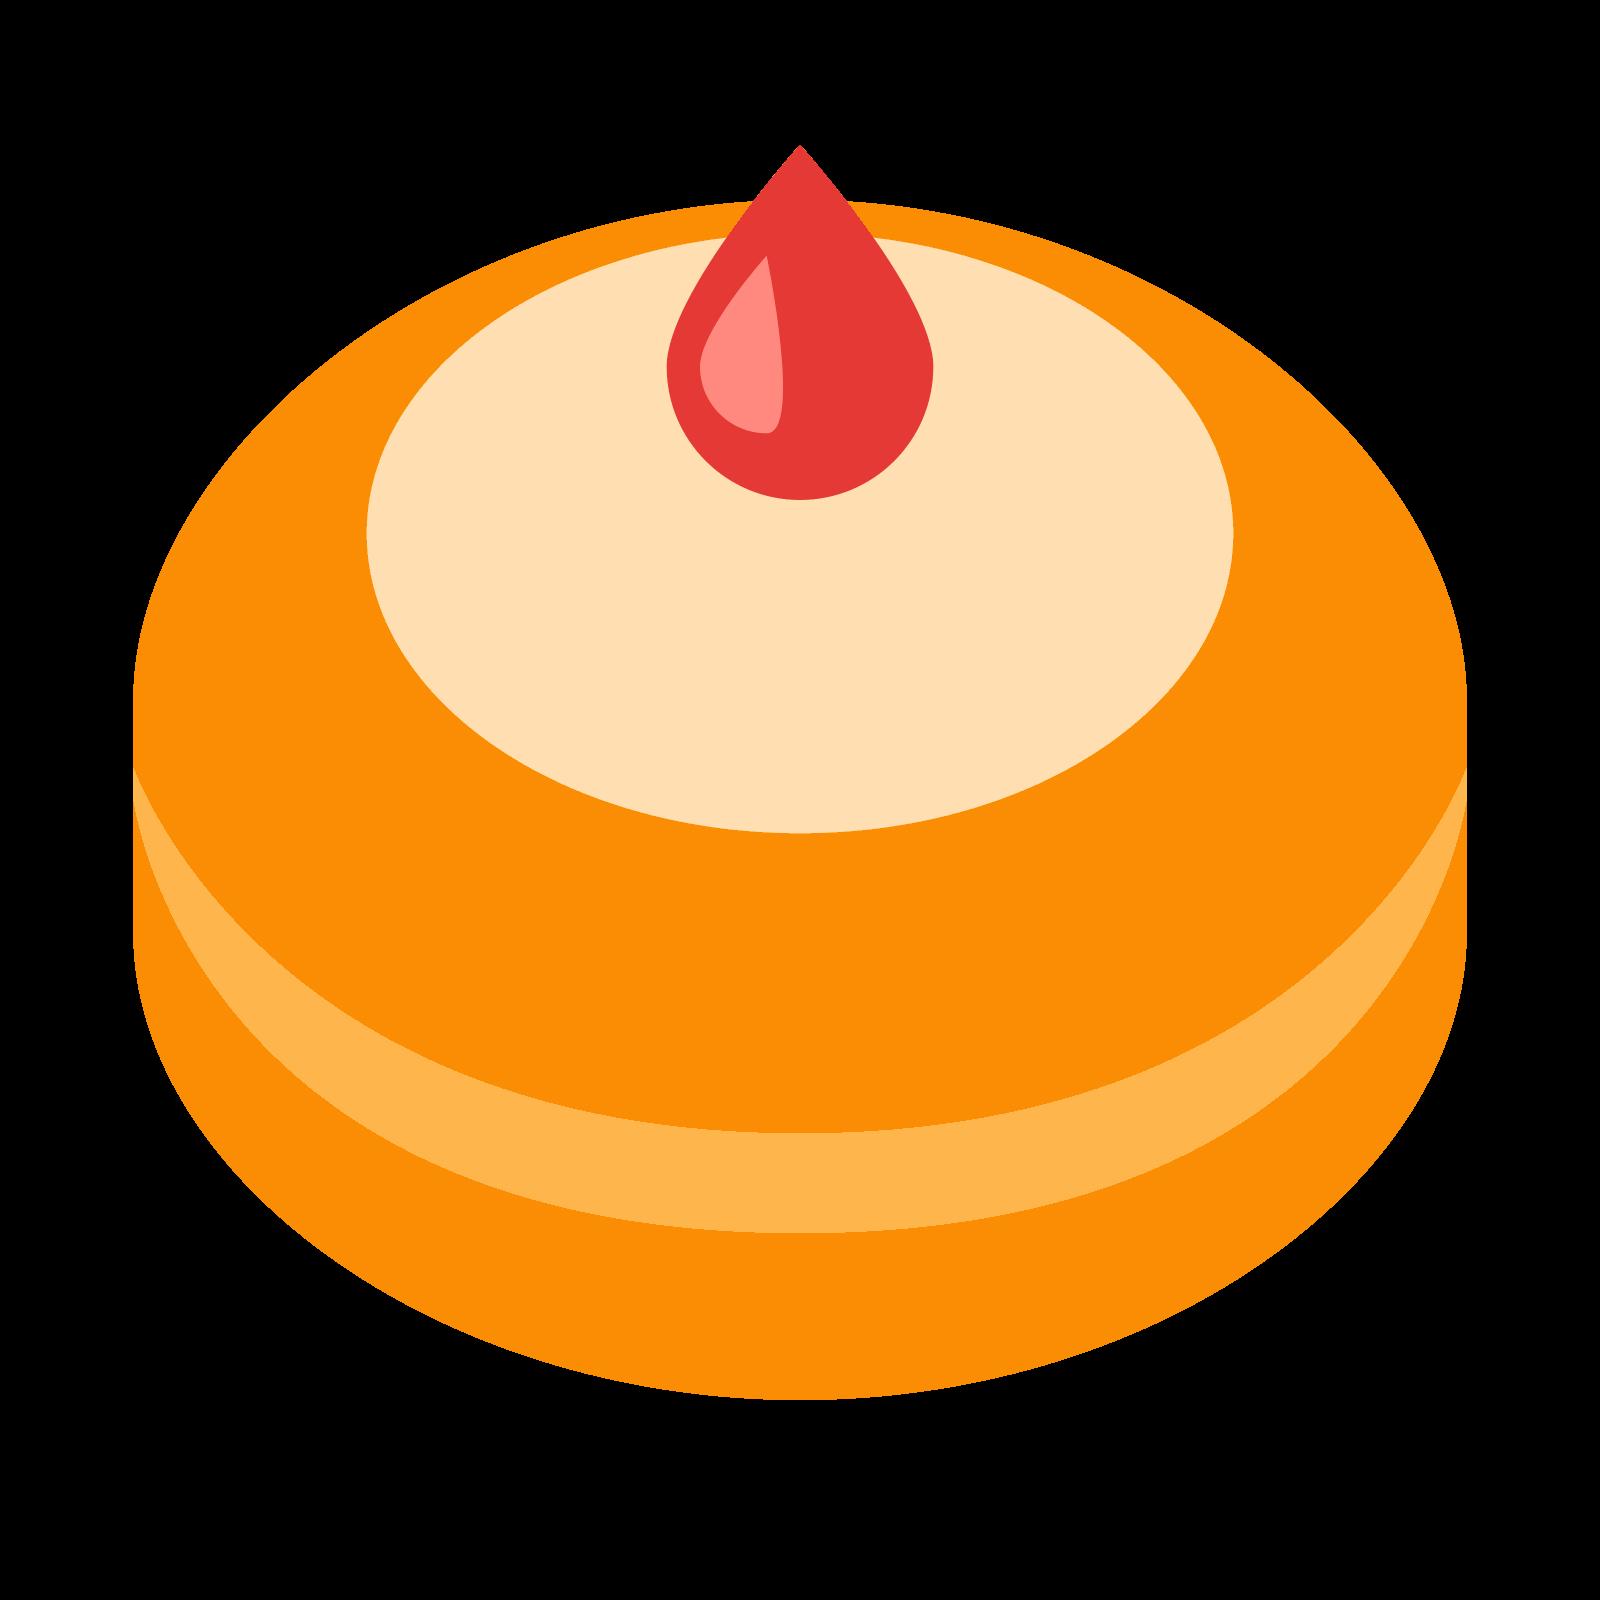 Hanukkah donut icon free. Doughnut clipart beignet